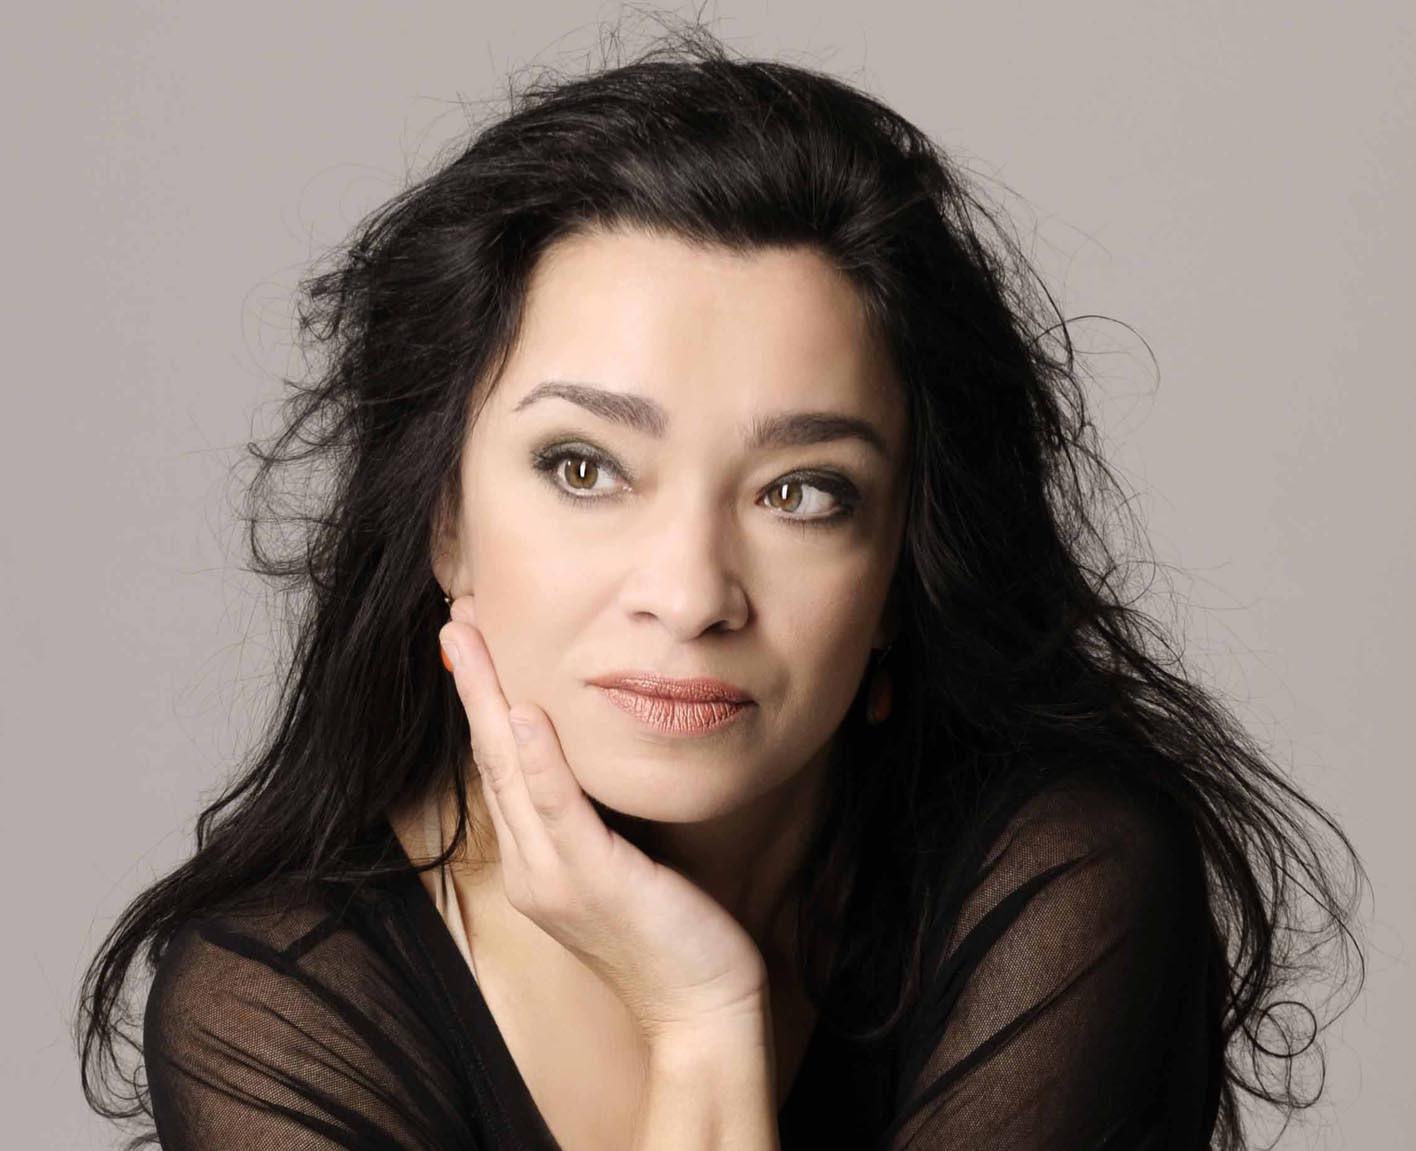 Klára Würtz (Piano solo) Zaterdag 14 oktober 2017